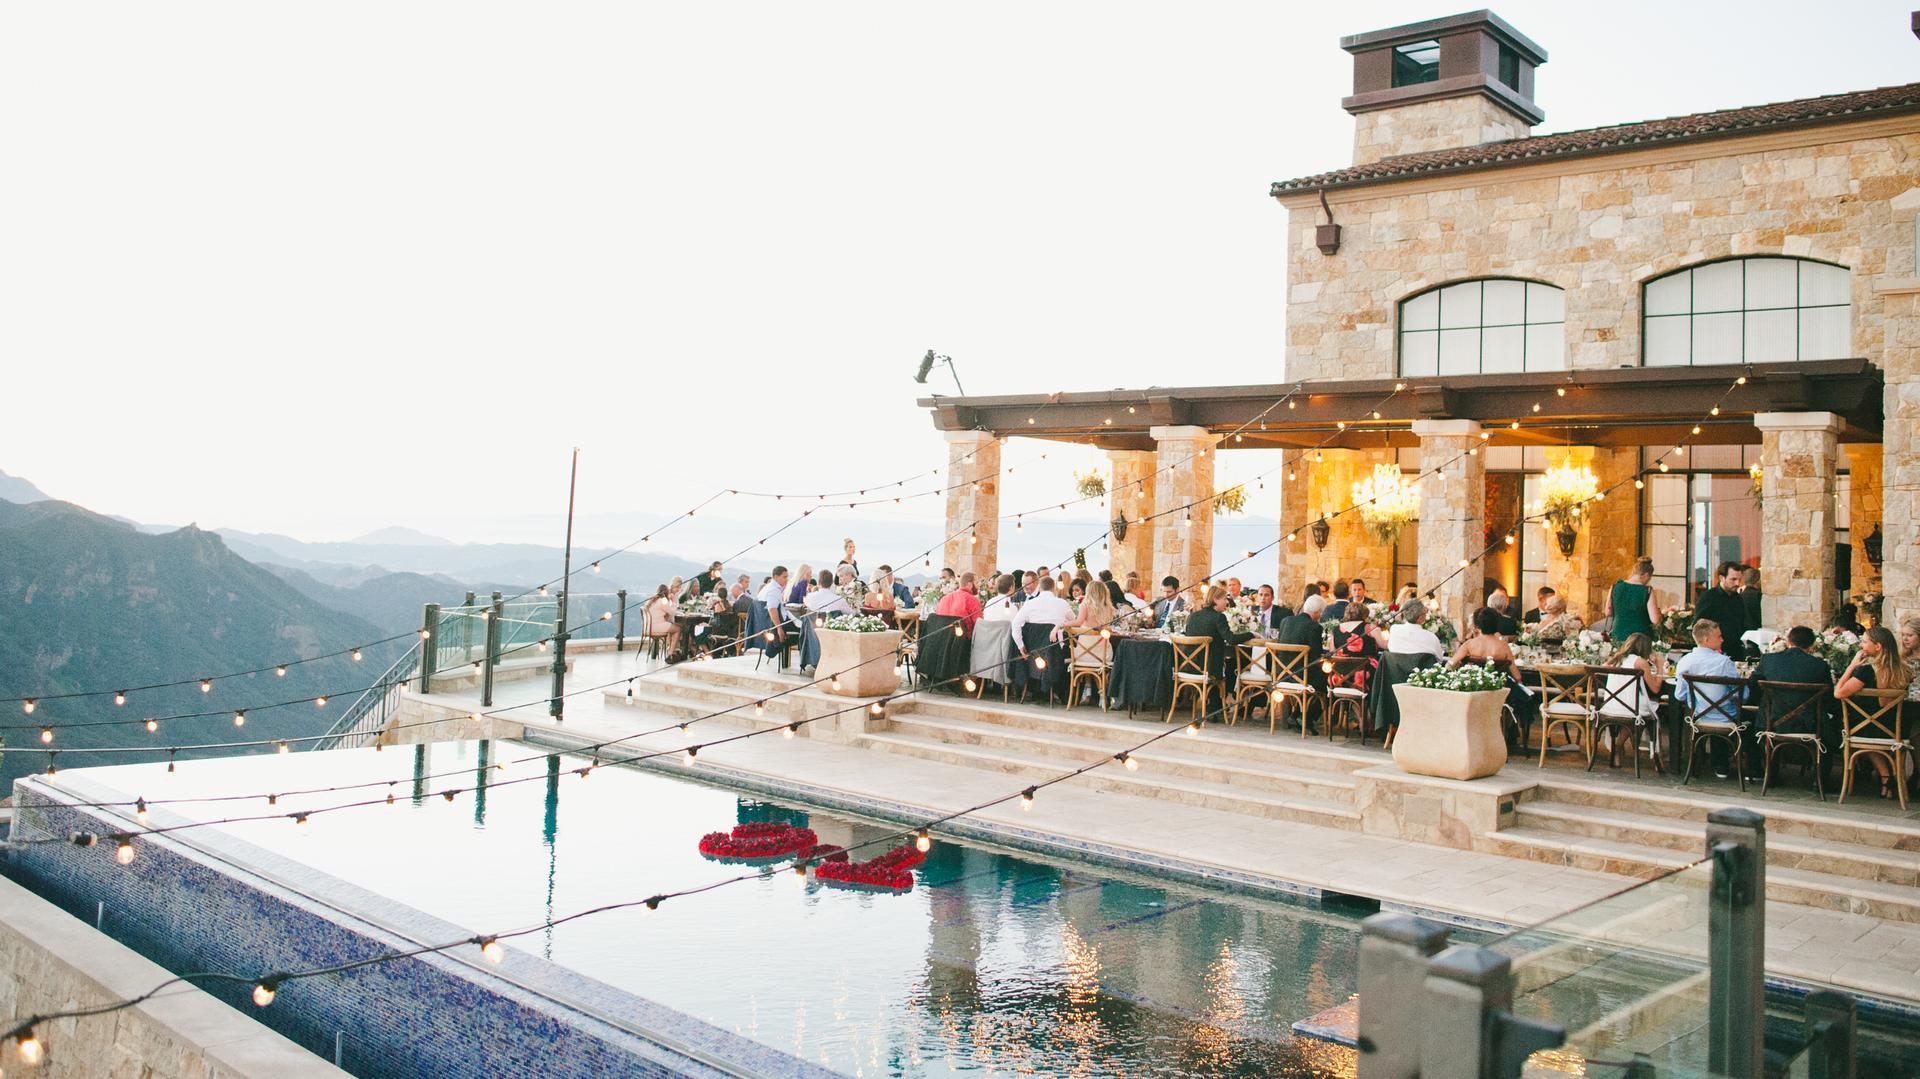 Malibu Rocky Oaks Wedding.Malibu Rocky Oaks Estate Vineyards Corporate Events Wedding